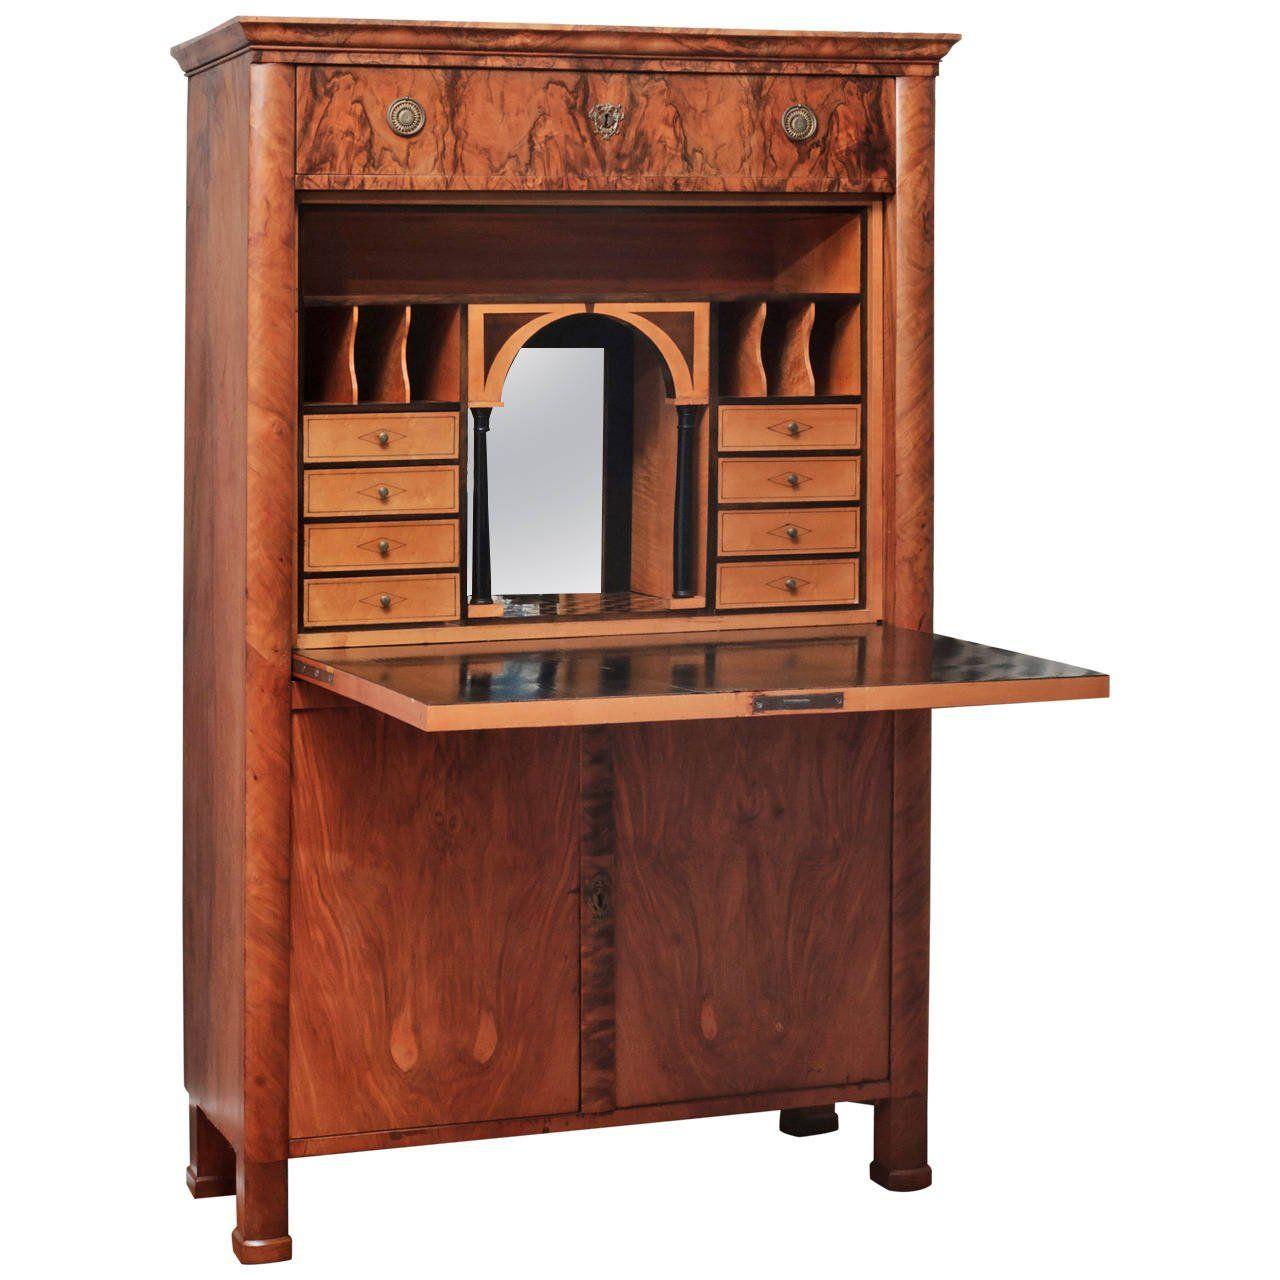 Biedermeier Secretaire a Abattant | From a unique collection of antique and modern secretaires at https://www.1stdibs.com/furniture/storage-case-pieces/secretaires/